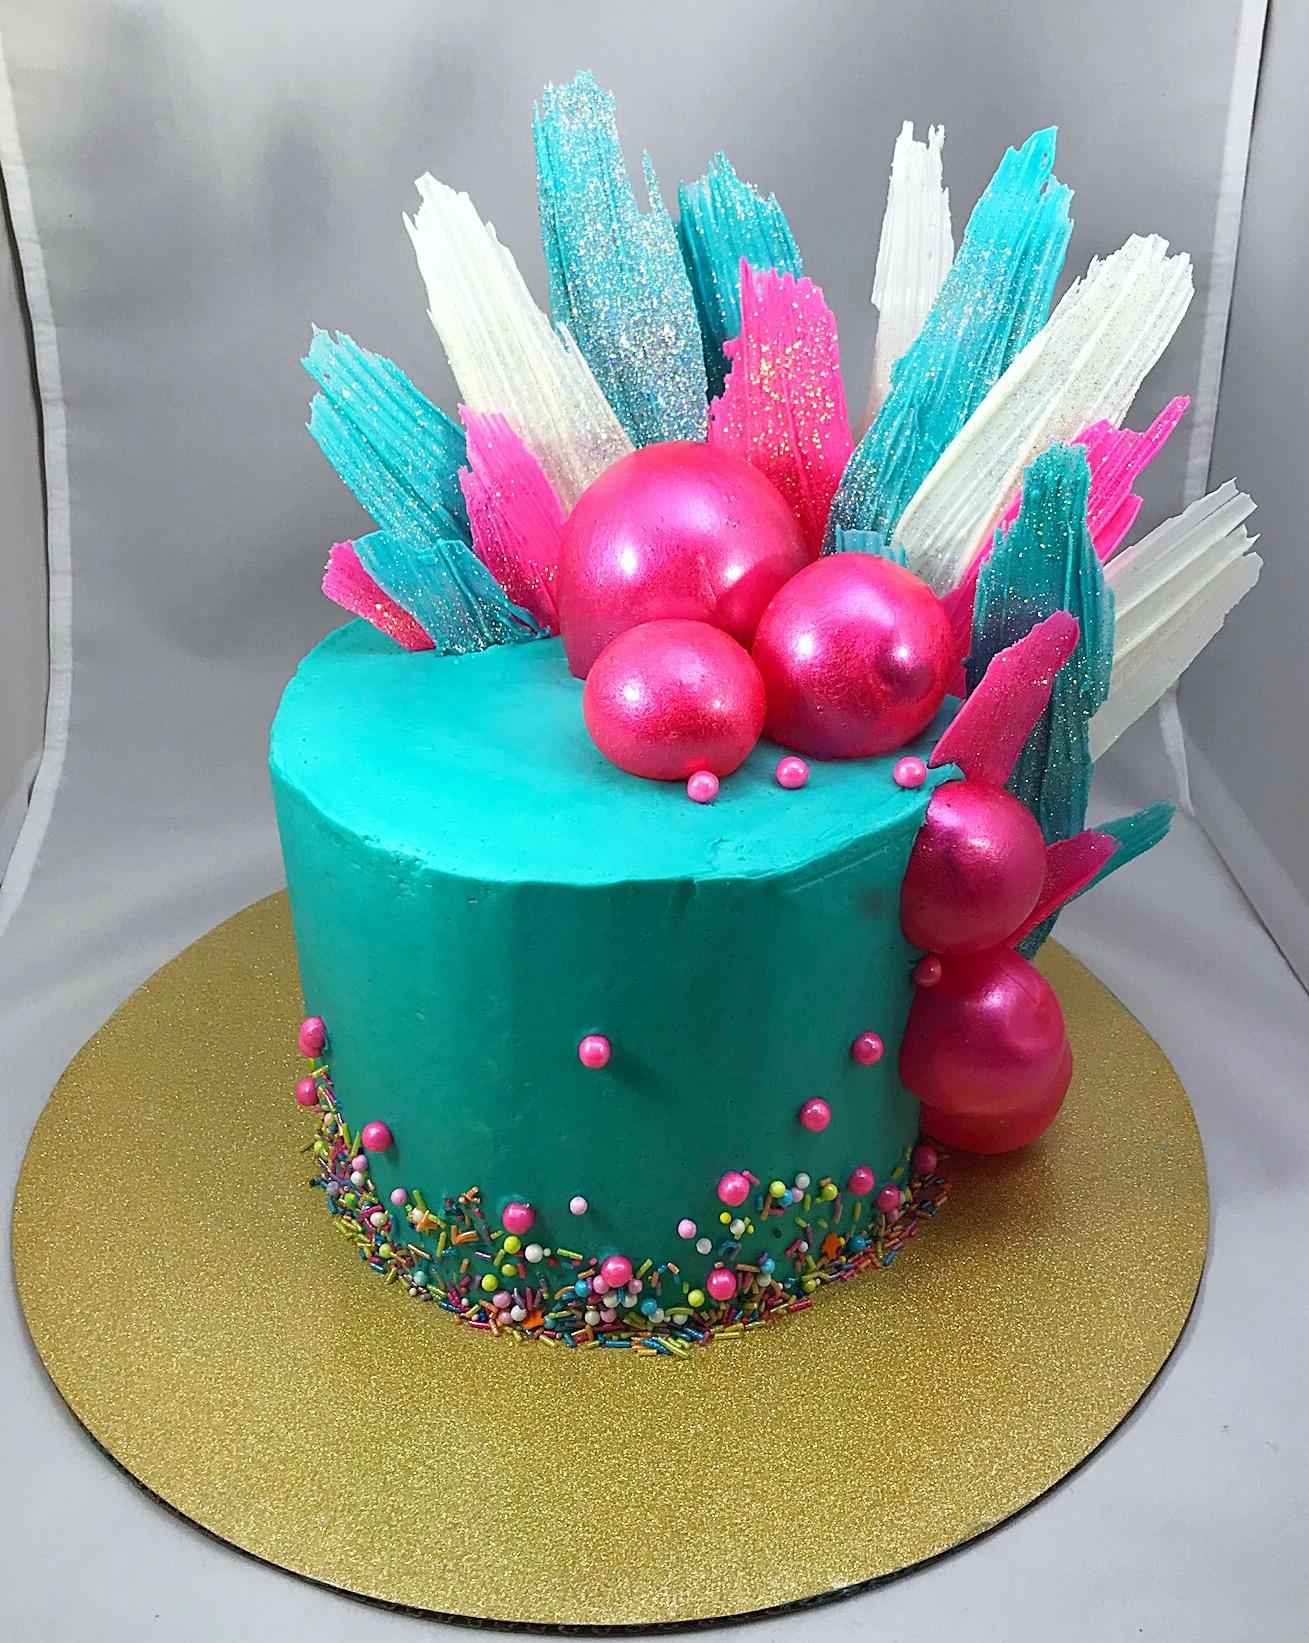 Corks Confections Gelatin Bubbles Cake With Chocolate Feathers W Liz BYOB